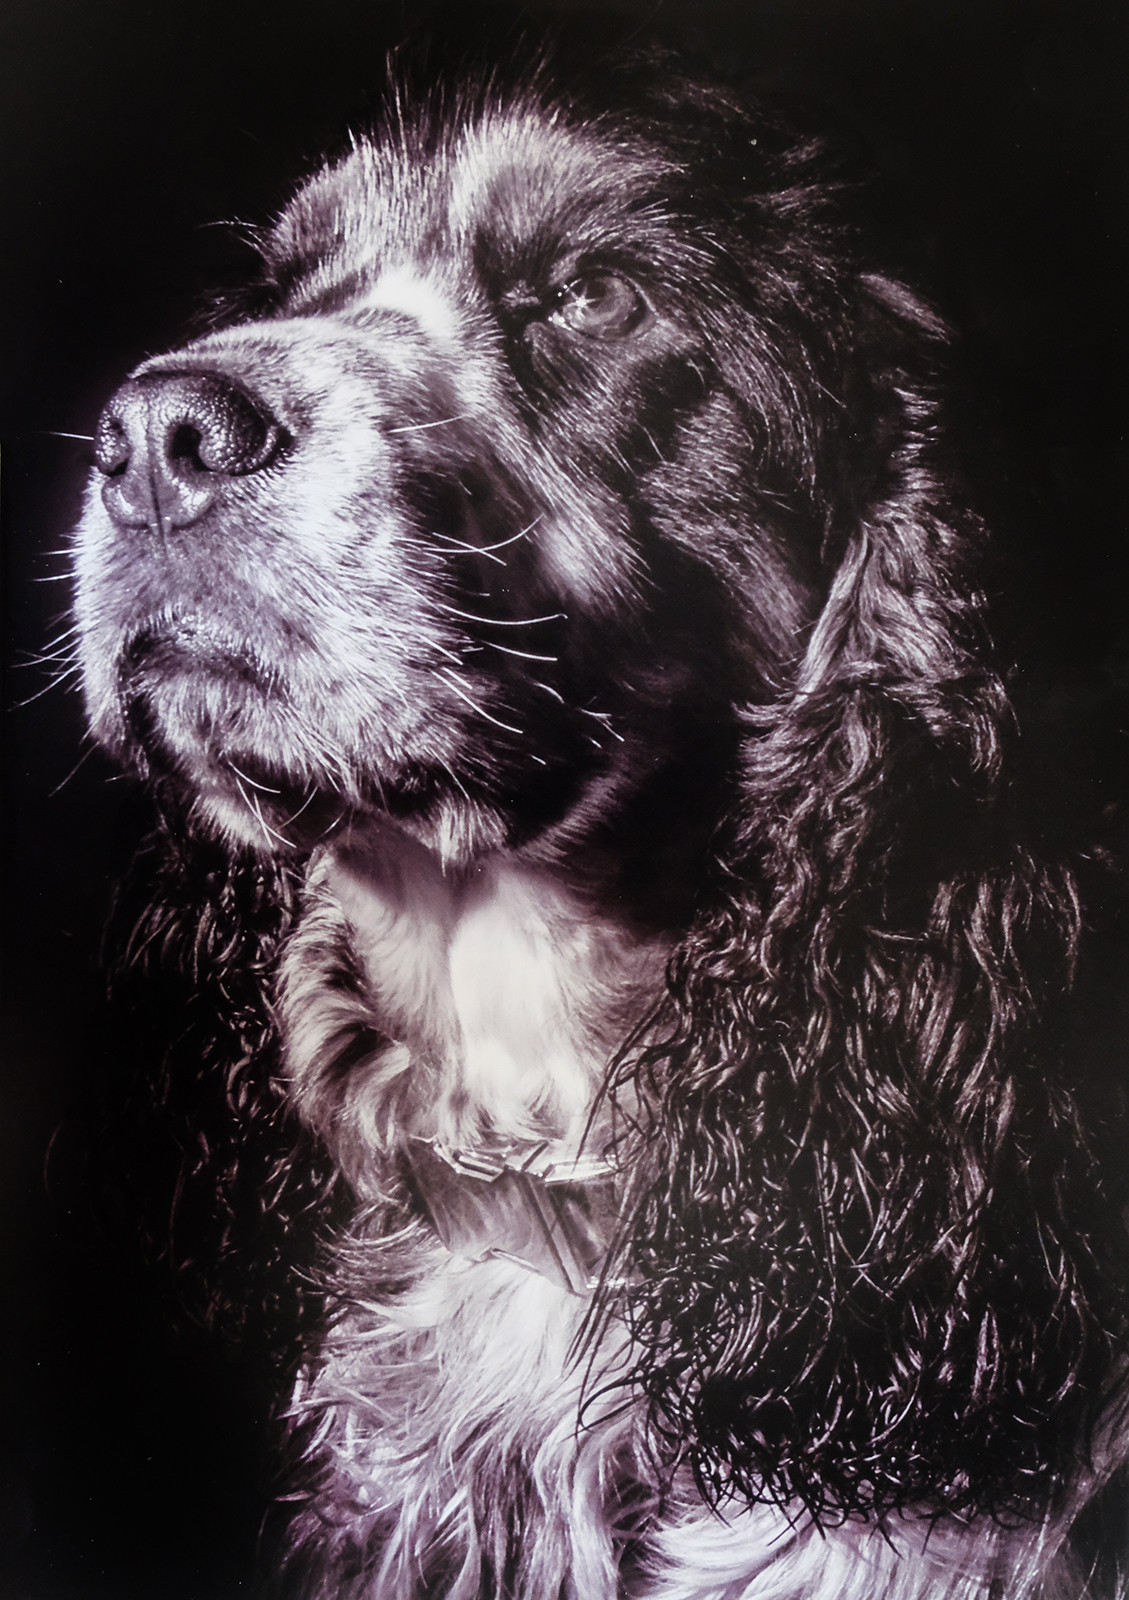 MONO - Sherlock by J McGinley (9 marks)